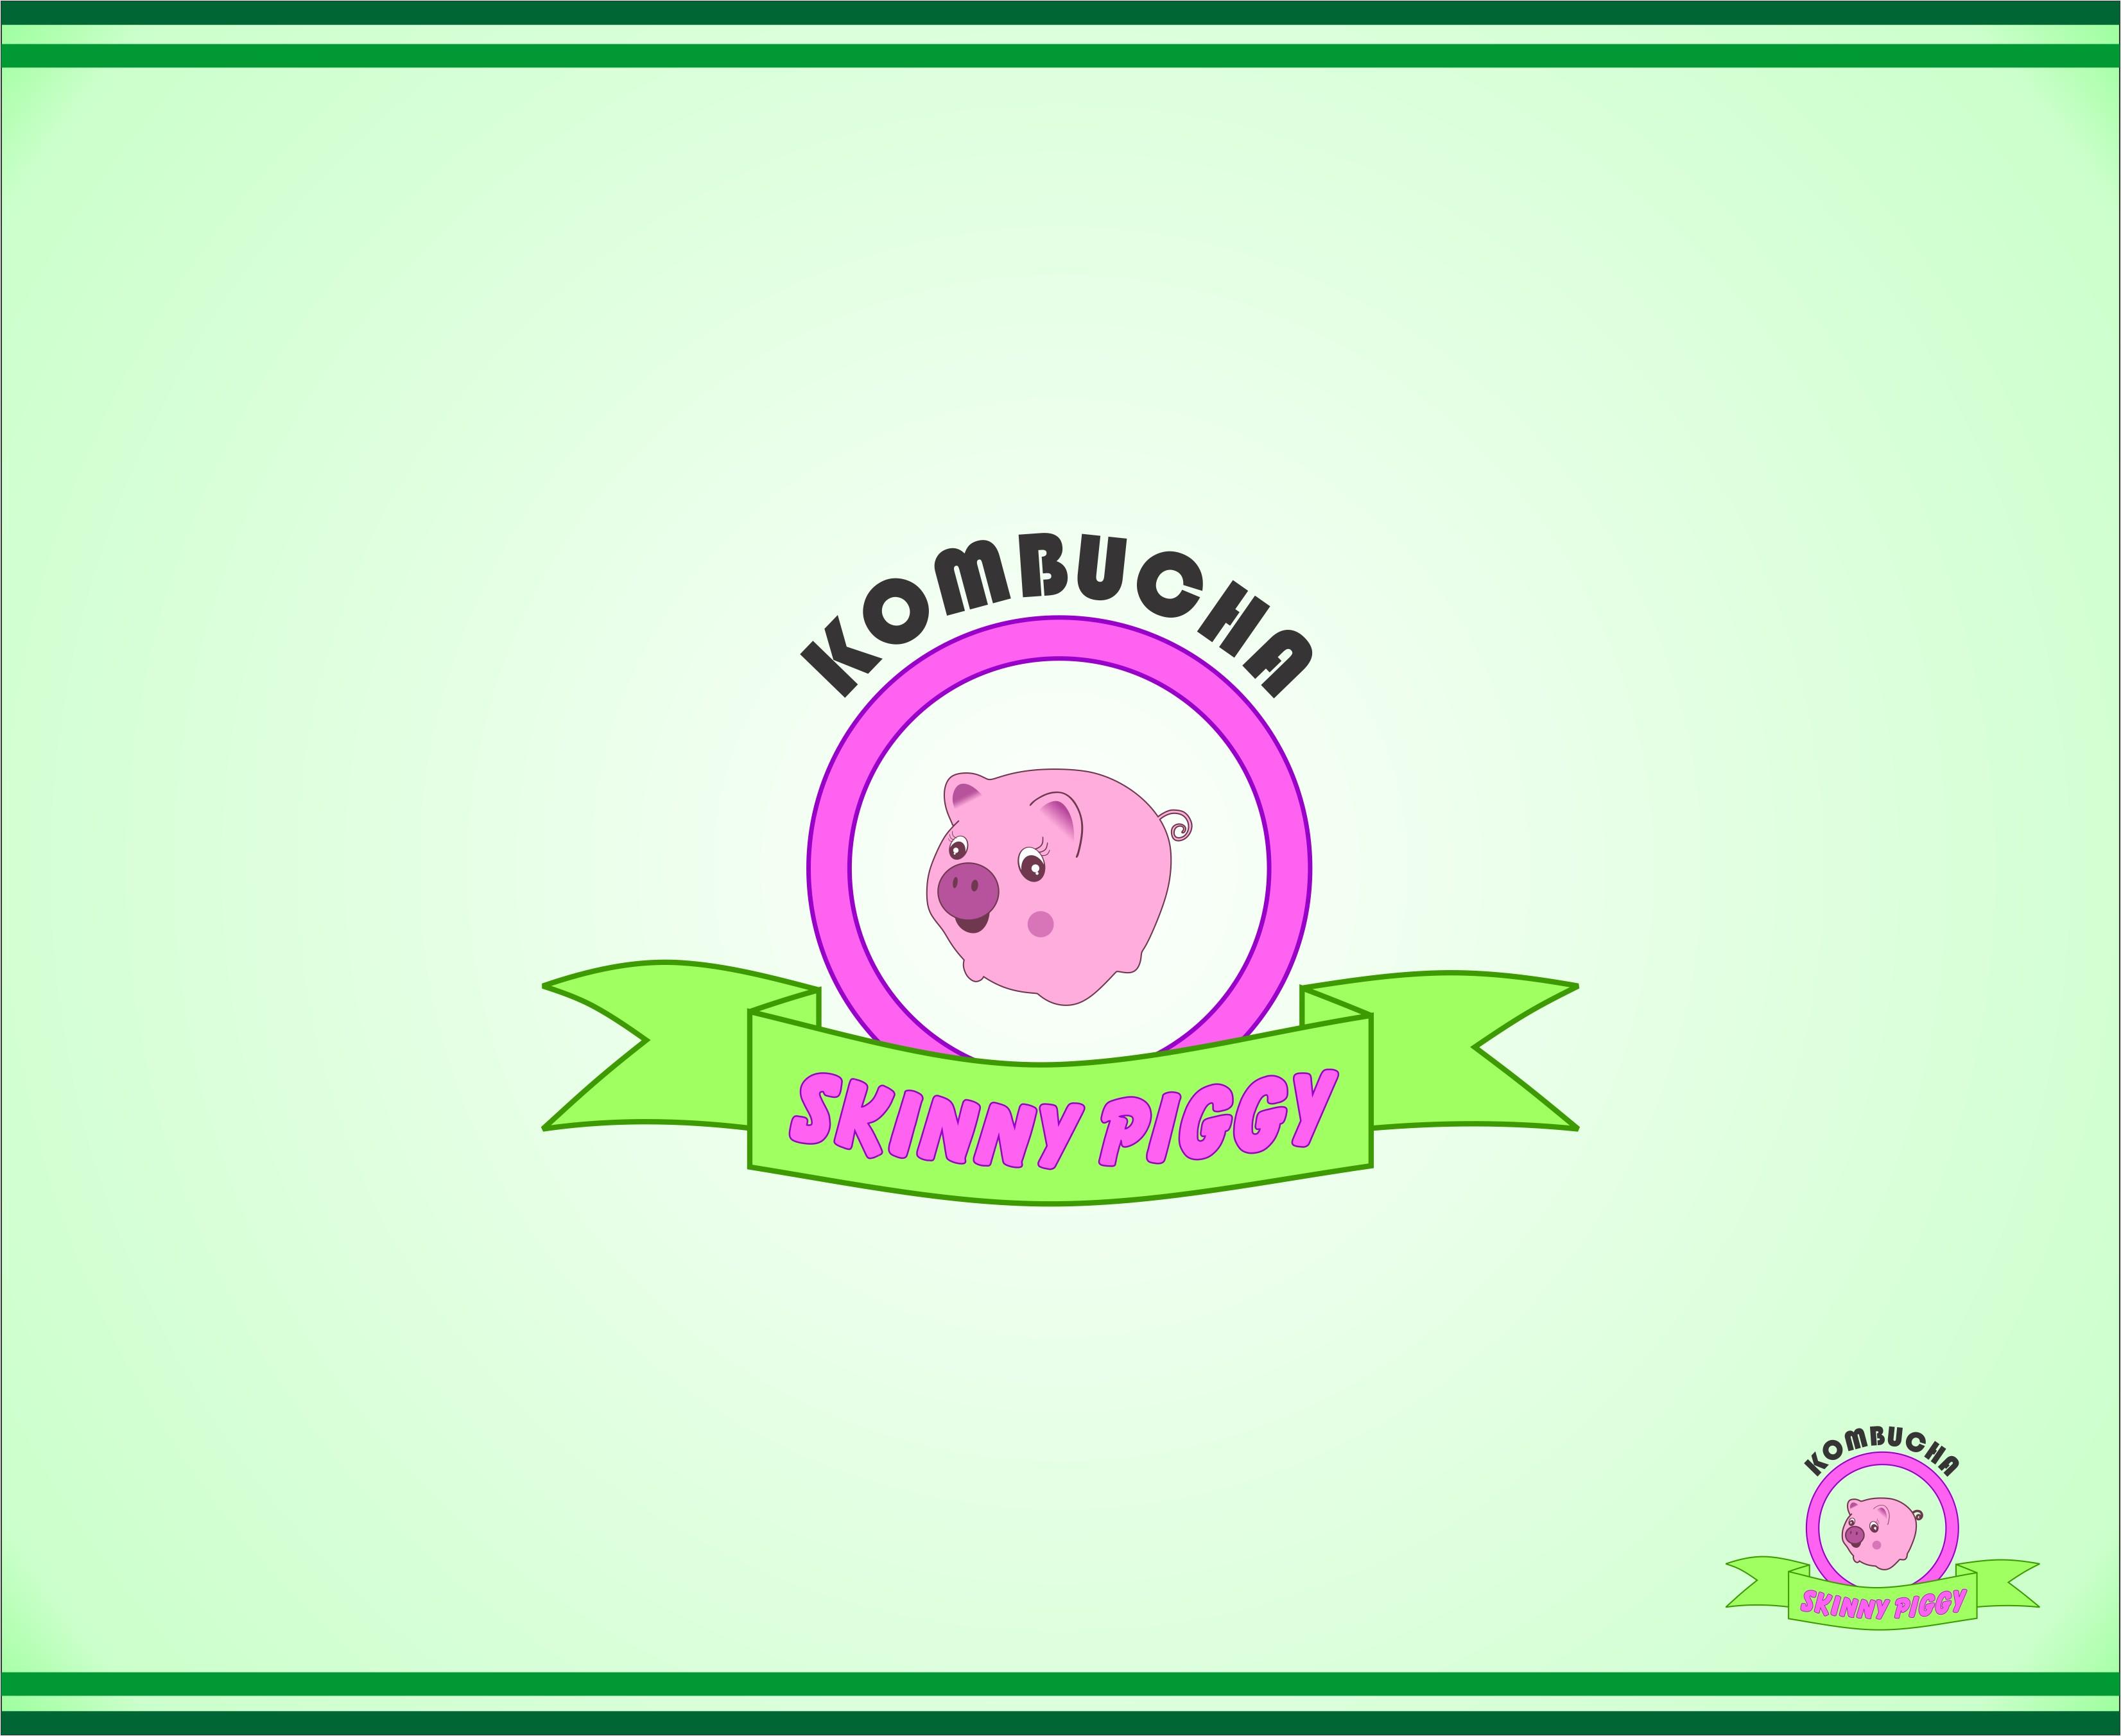 Logo Design by Mhon_Rose - Entry No. 44 in the Logo Design Contest Fun Logo Design for Skinny Piggy.